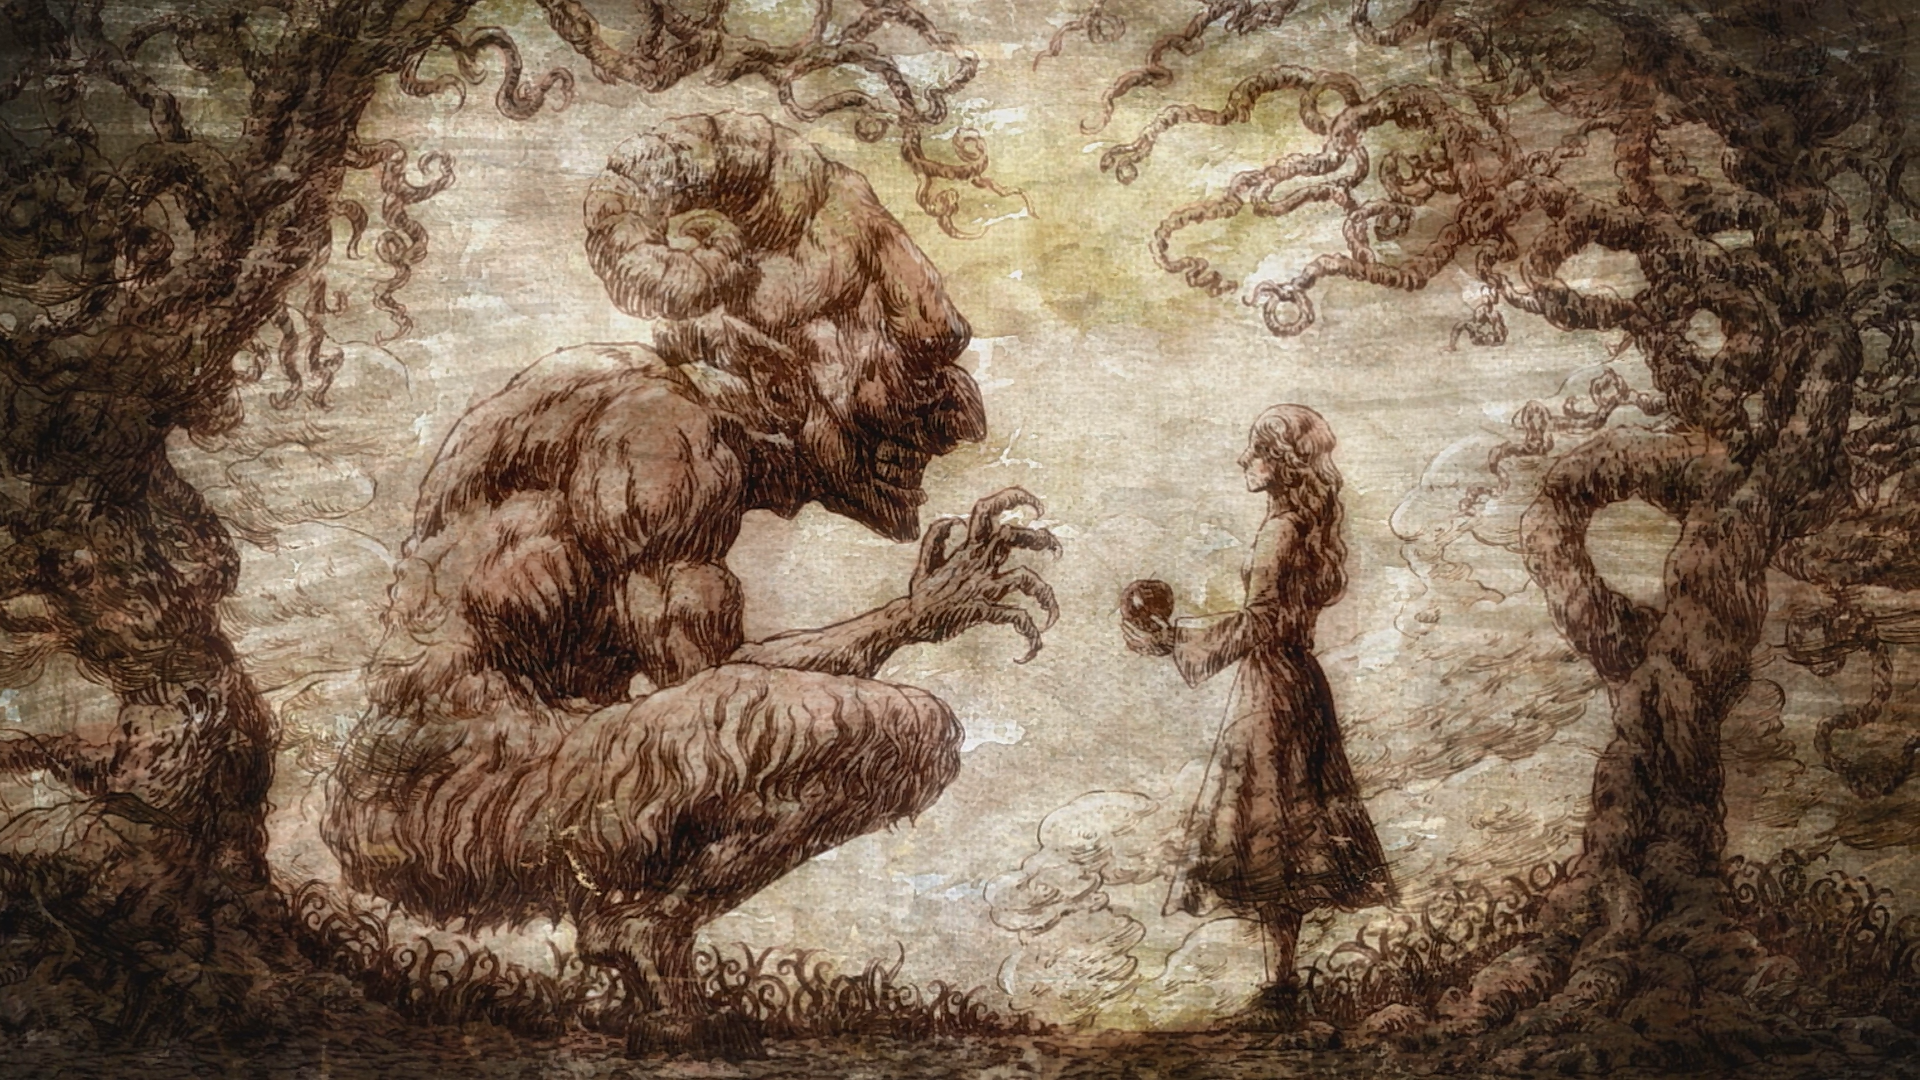 Fritz Family Anime Attack On Titan Wiki Fandom